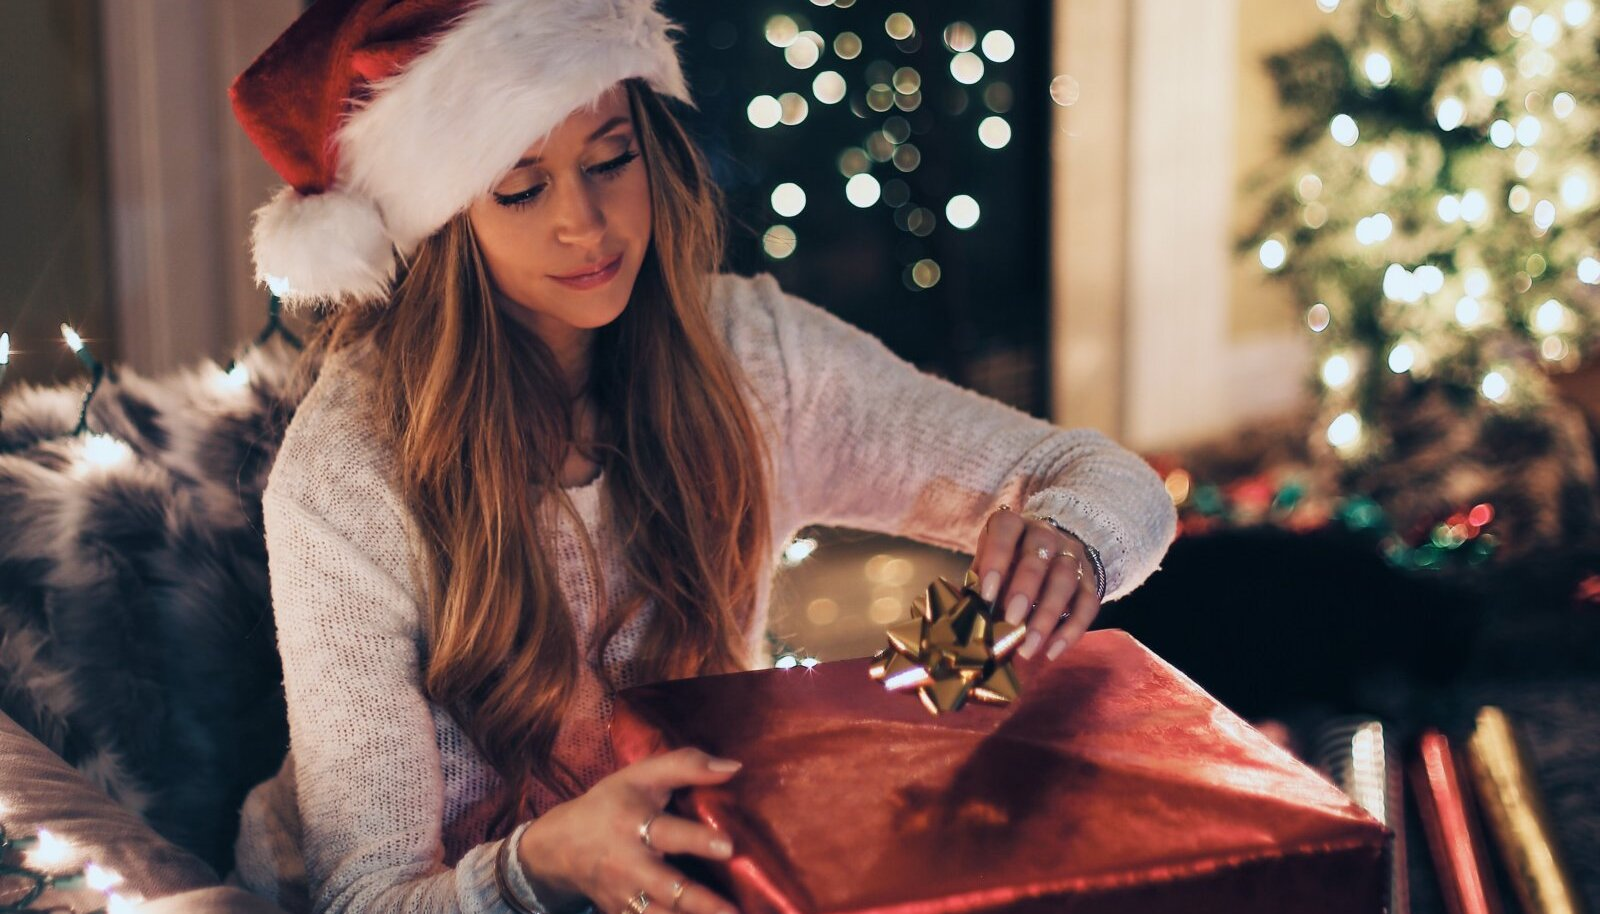 Jõulud üksinda